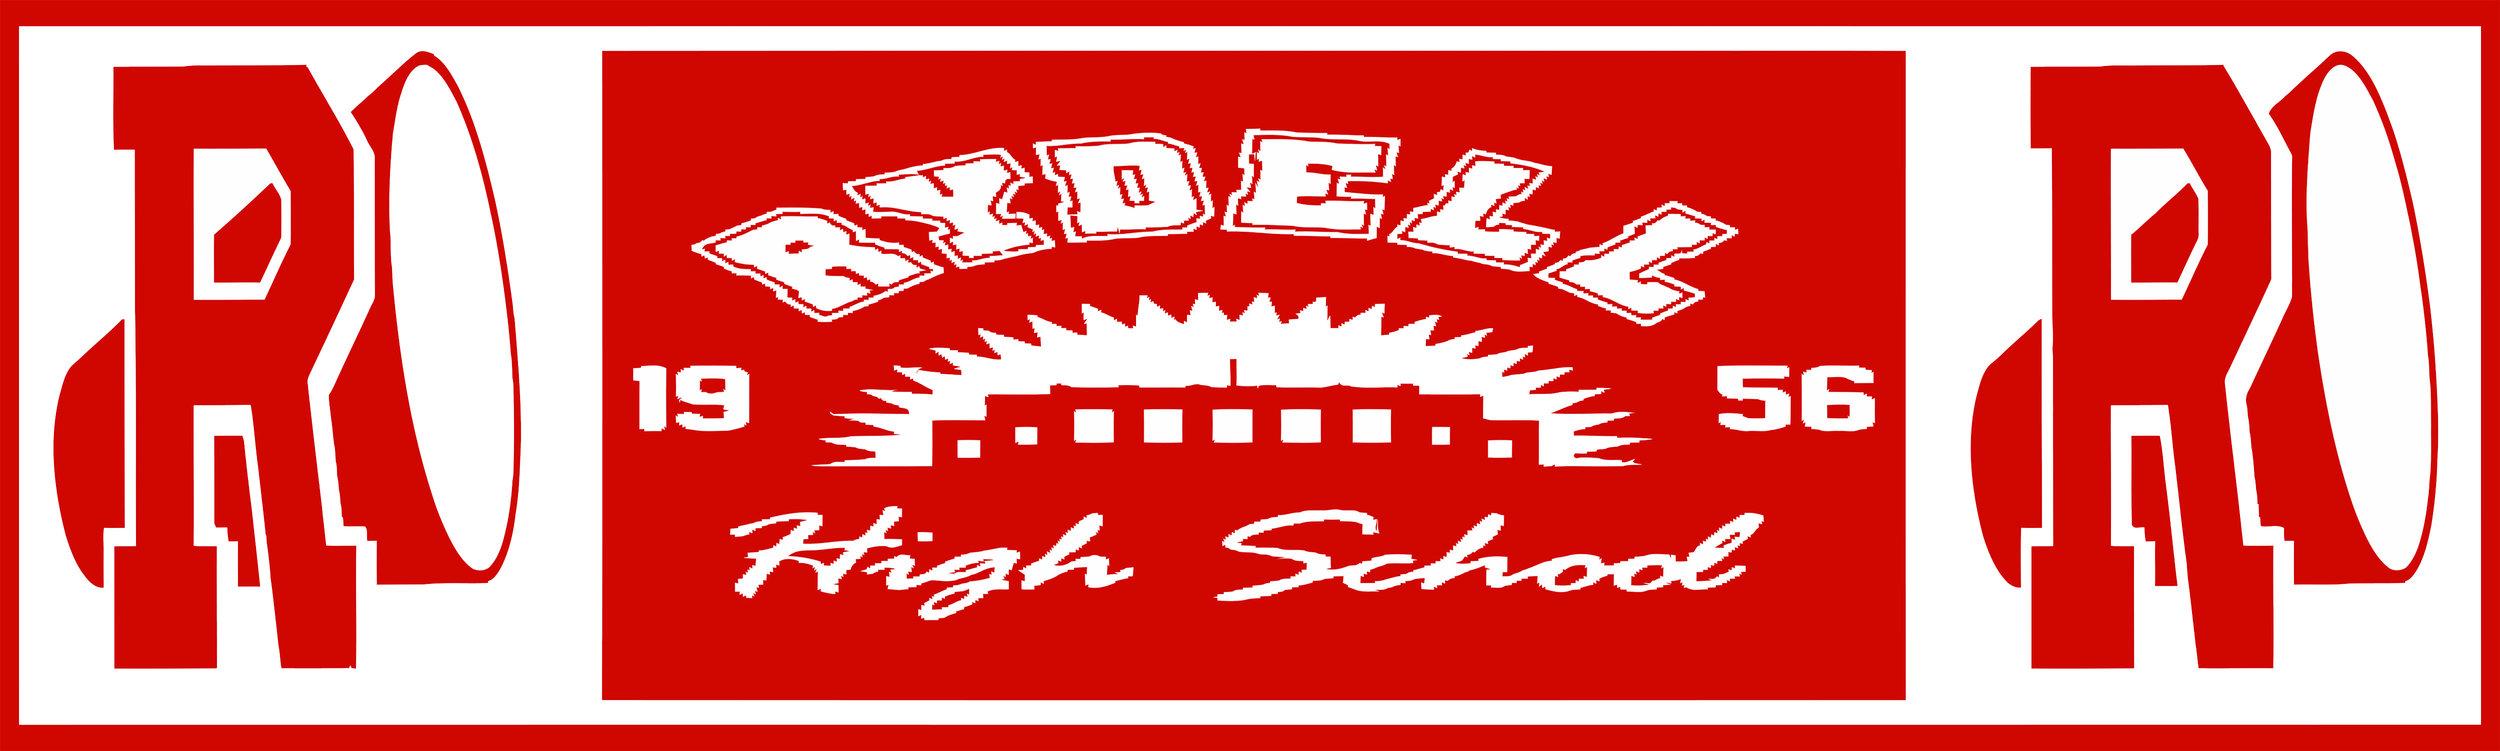 RYDELL High School Banner - 10' x 3'